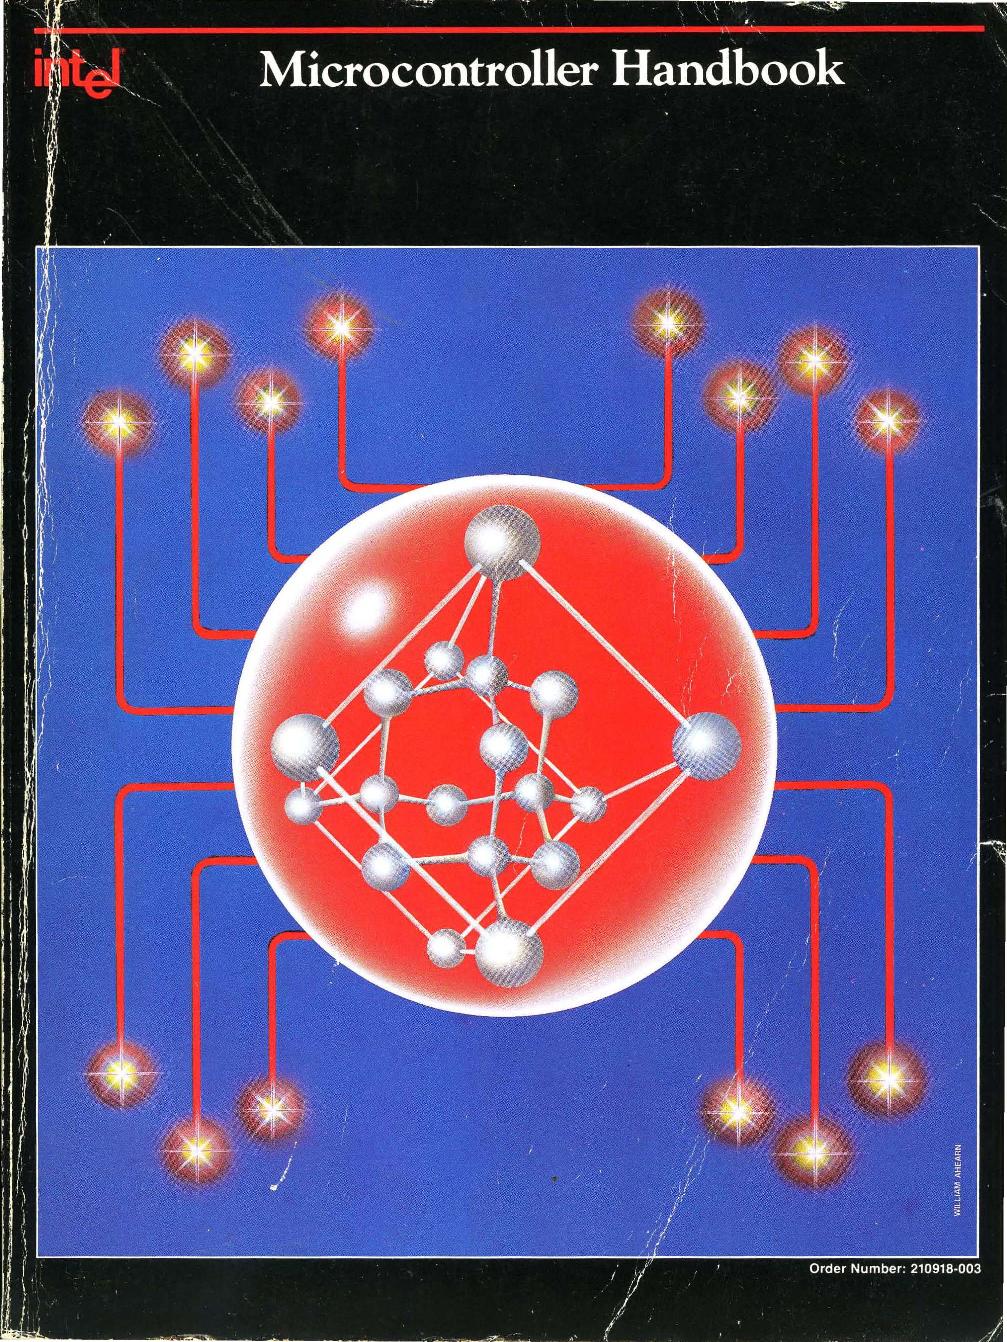 1985_Intel_Microcontroller_Handbook 1985 Intel